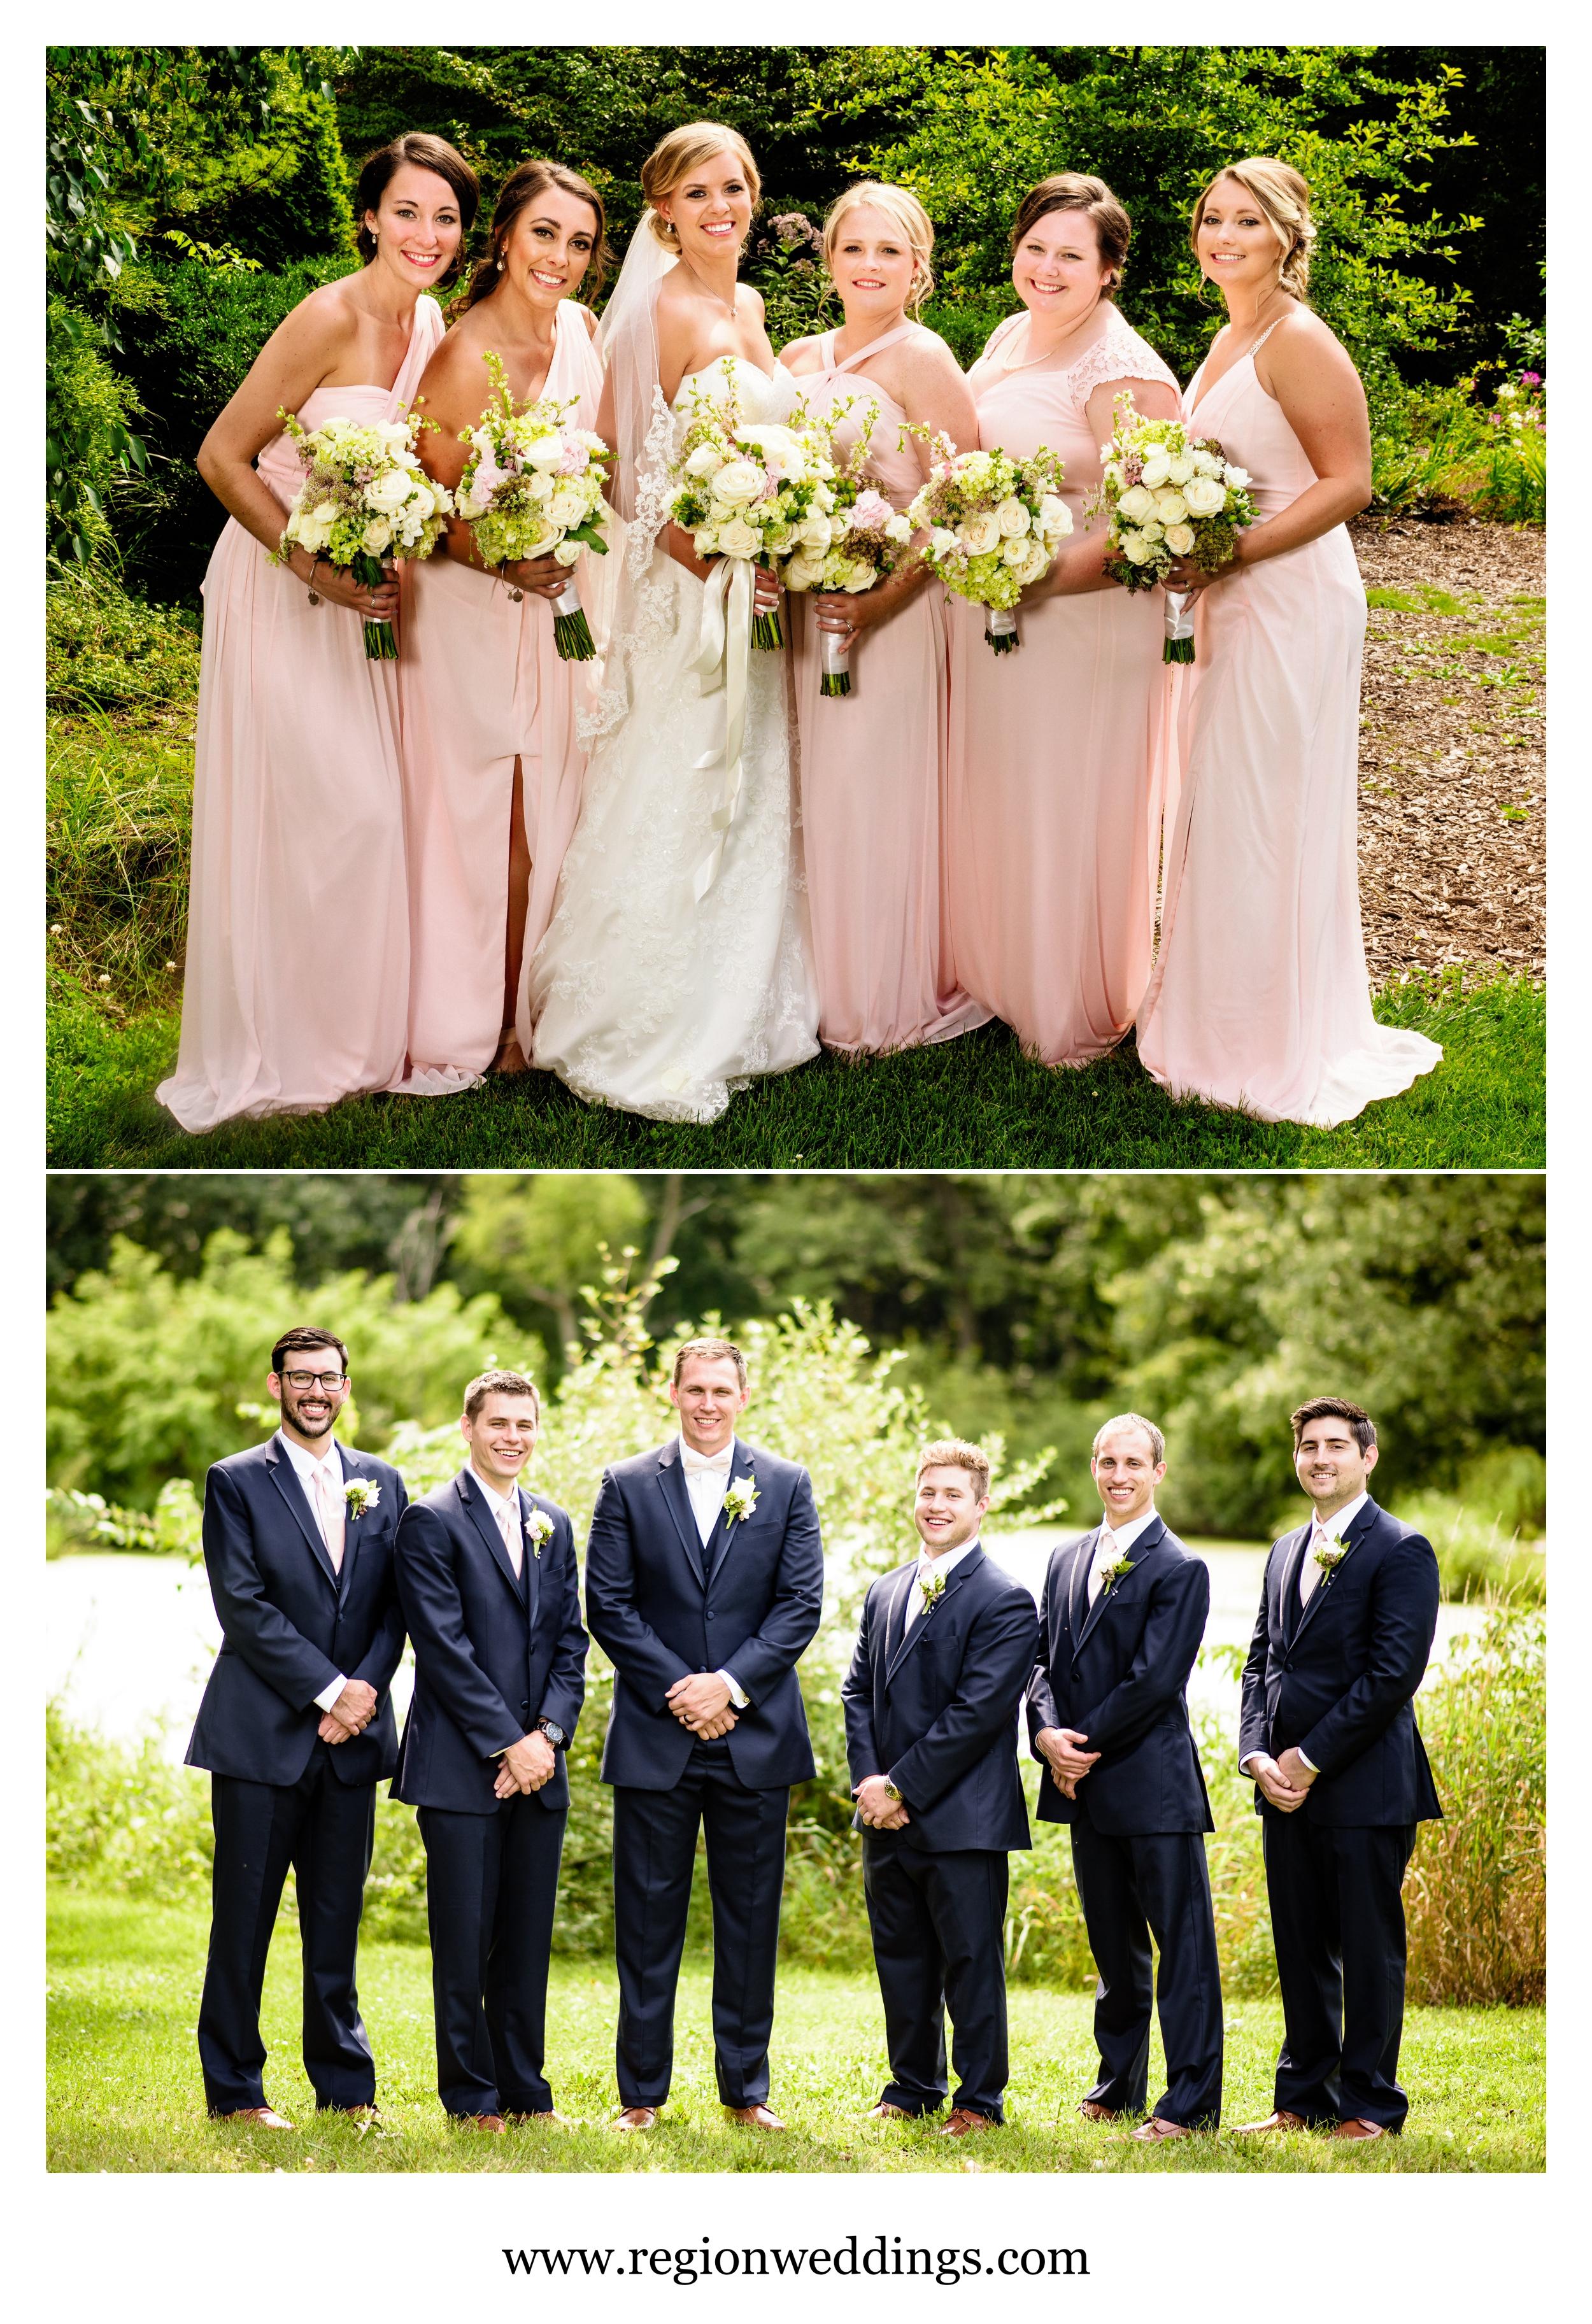 Bridesmaid and groomsmen group photos at Taltree Arboretum.